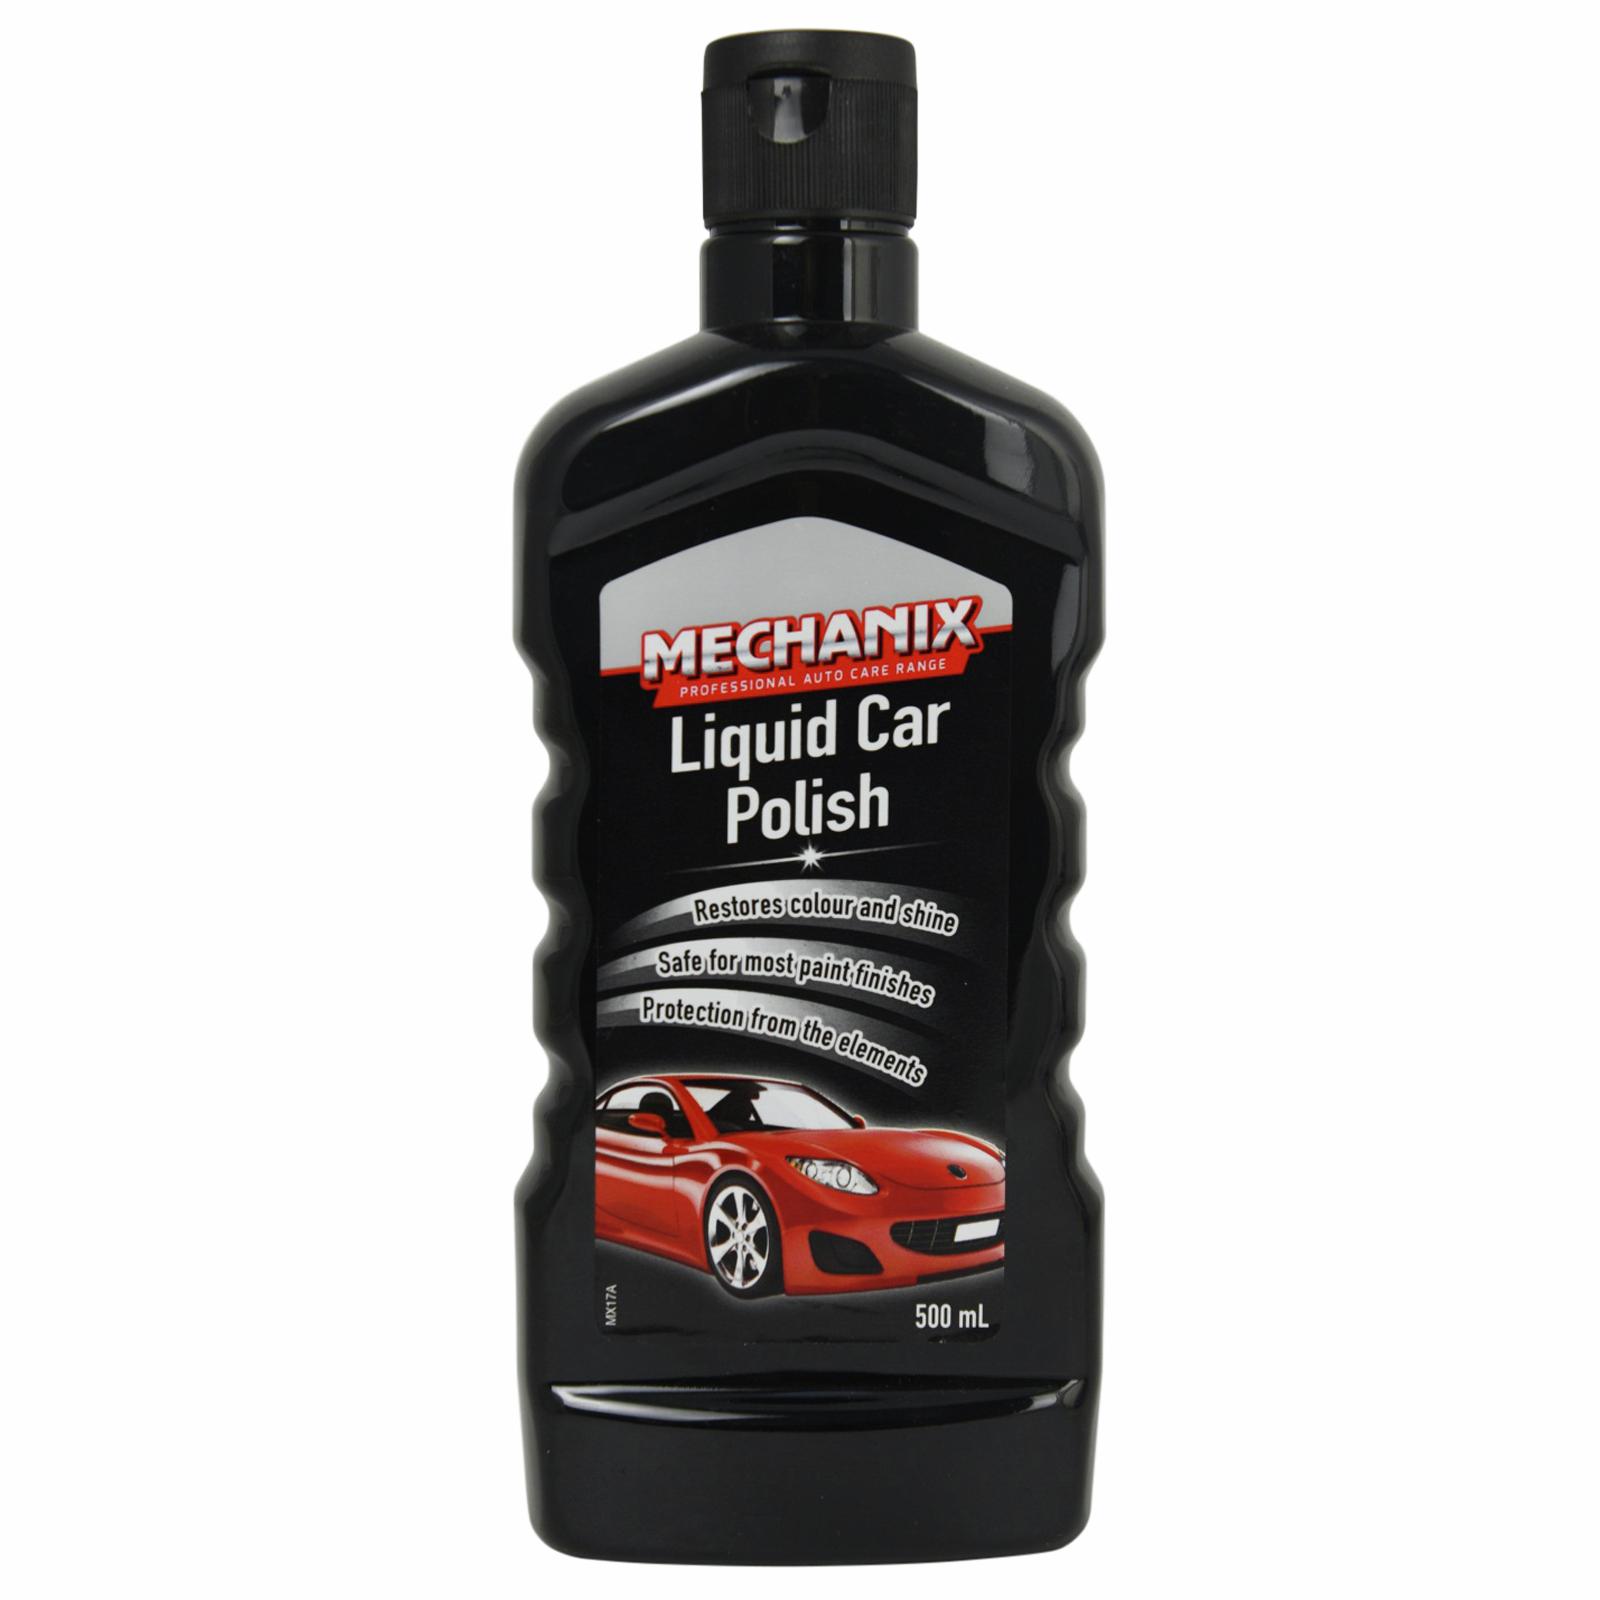 Mechanix 500ml Liquid Car Polish